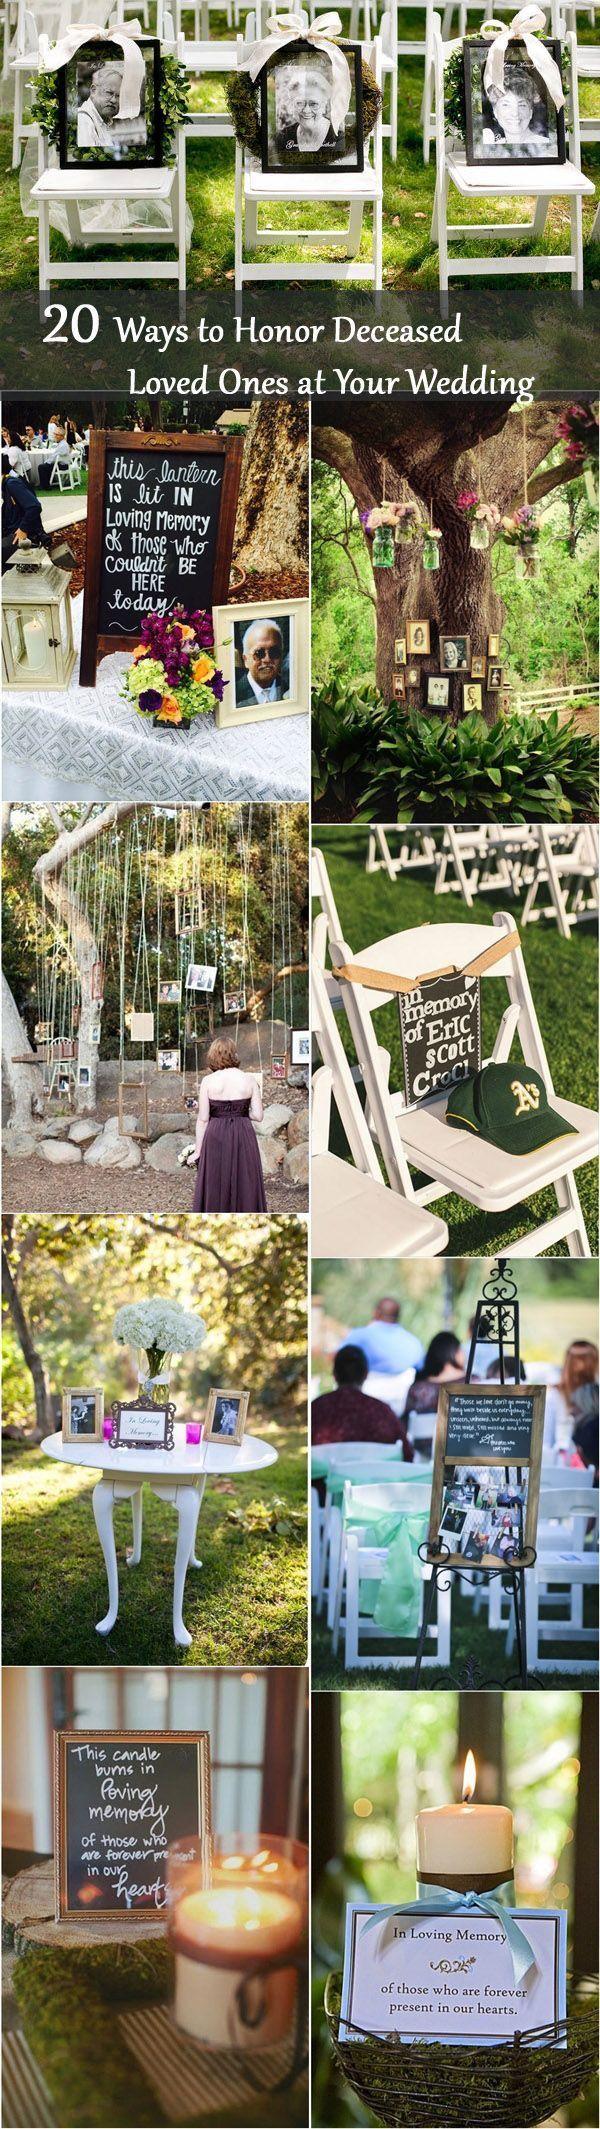 Pin by Angélica Izidoro on ideas | Wedding memorial, Backyard ...